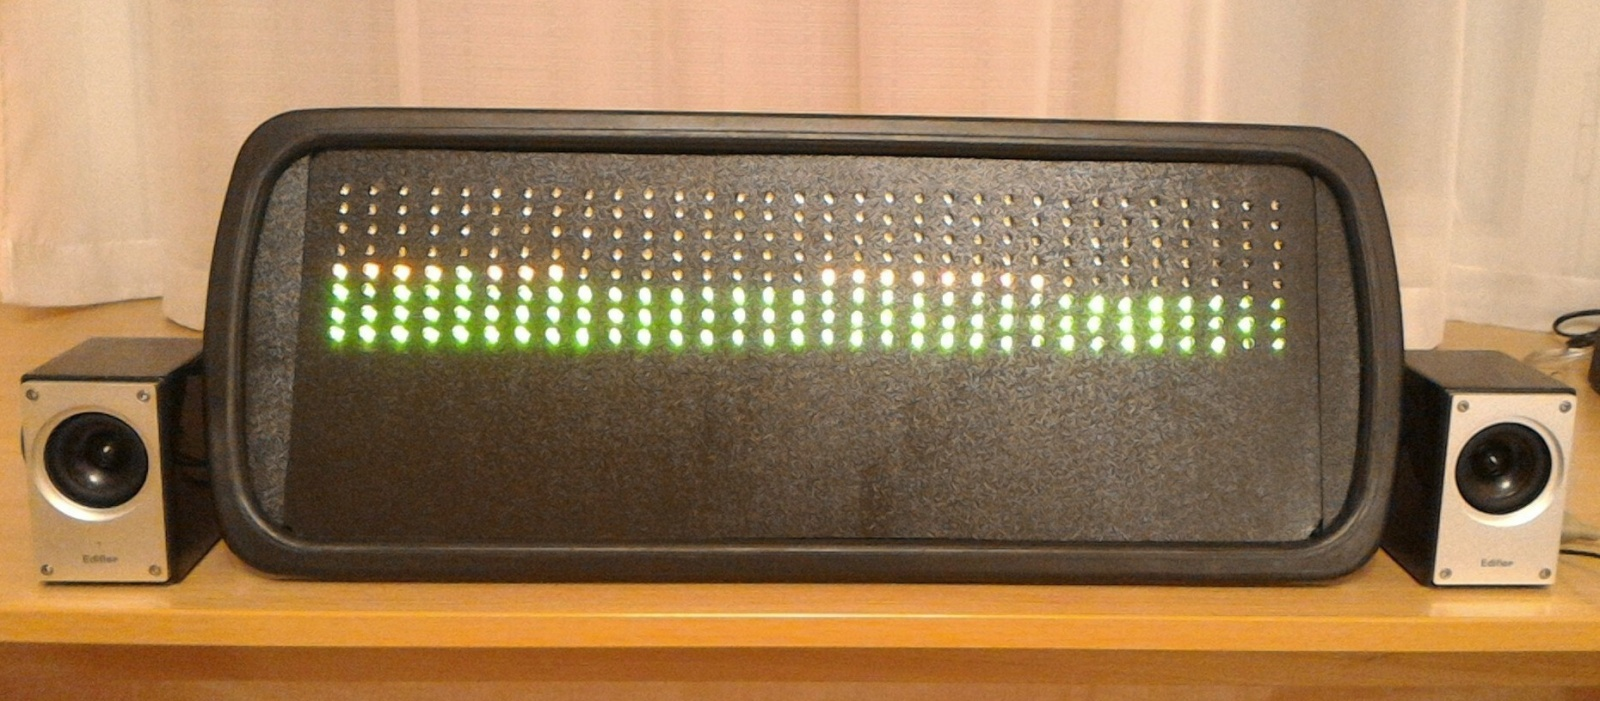 Анализатор-визуализатор спектра аудио сигнала на базе Arduino - 21